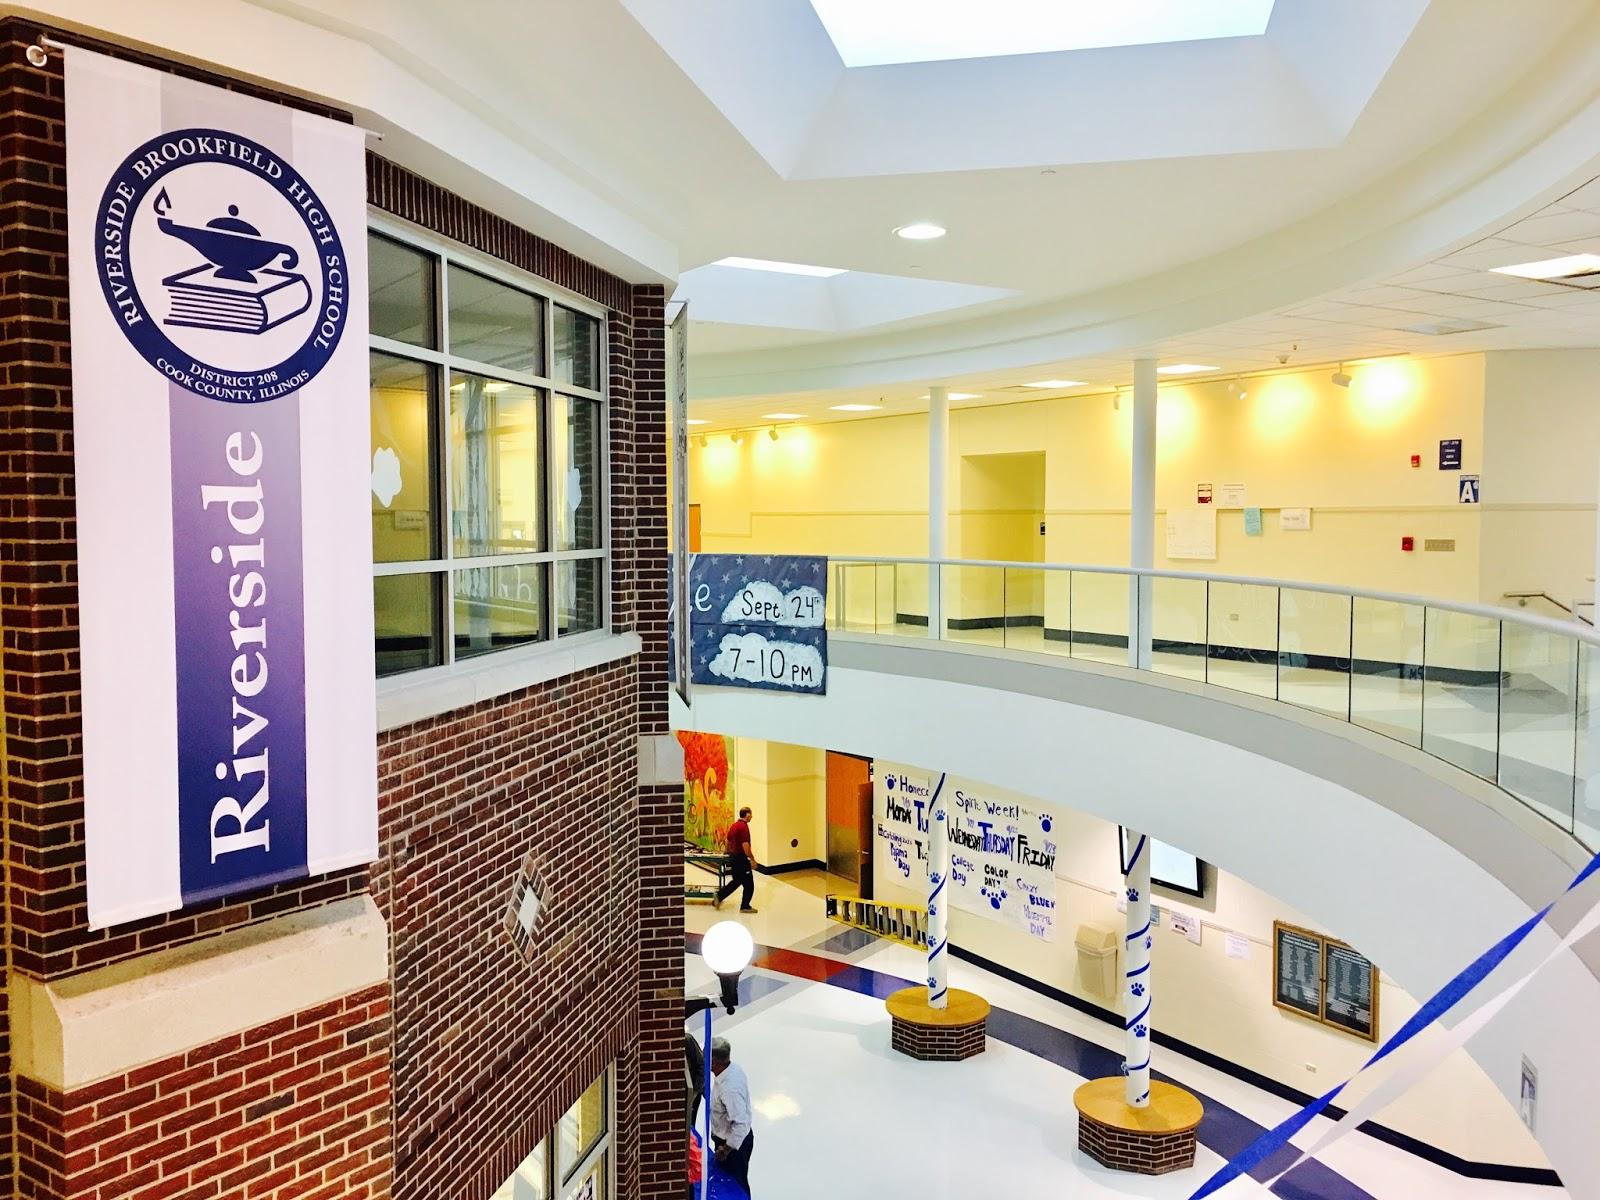 Touring Riverside-Brookfield High School